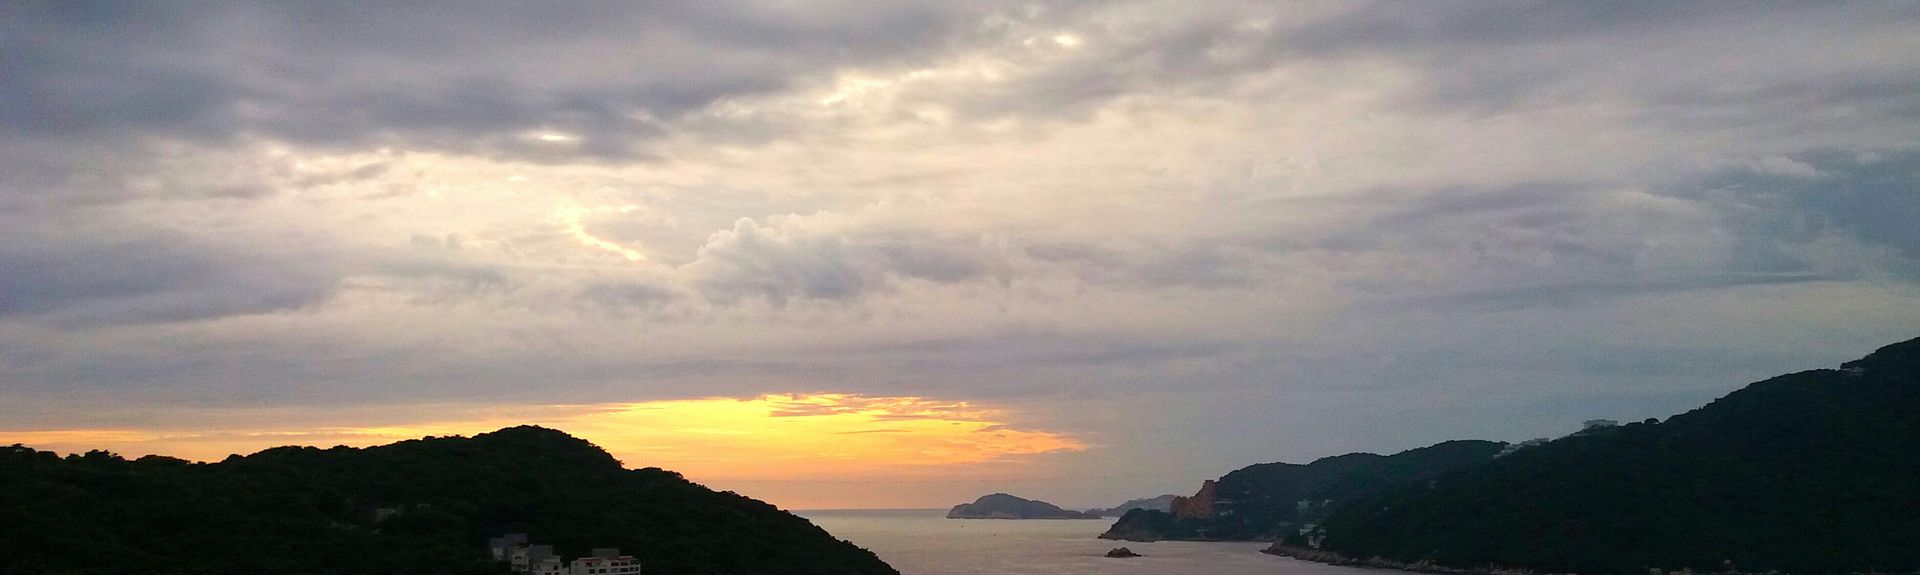 Punta Diamante, Acapulco, Gro., Mexico